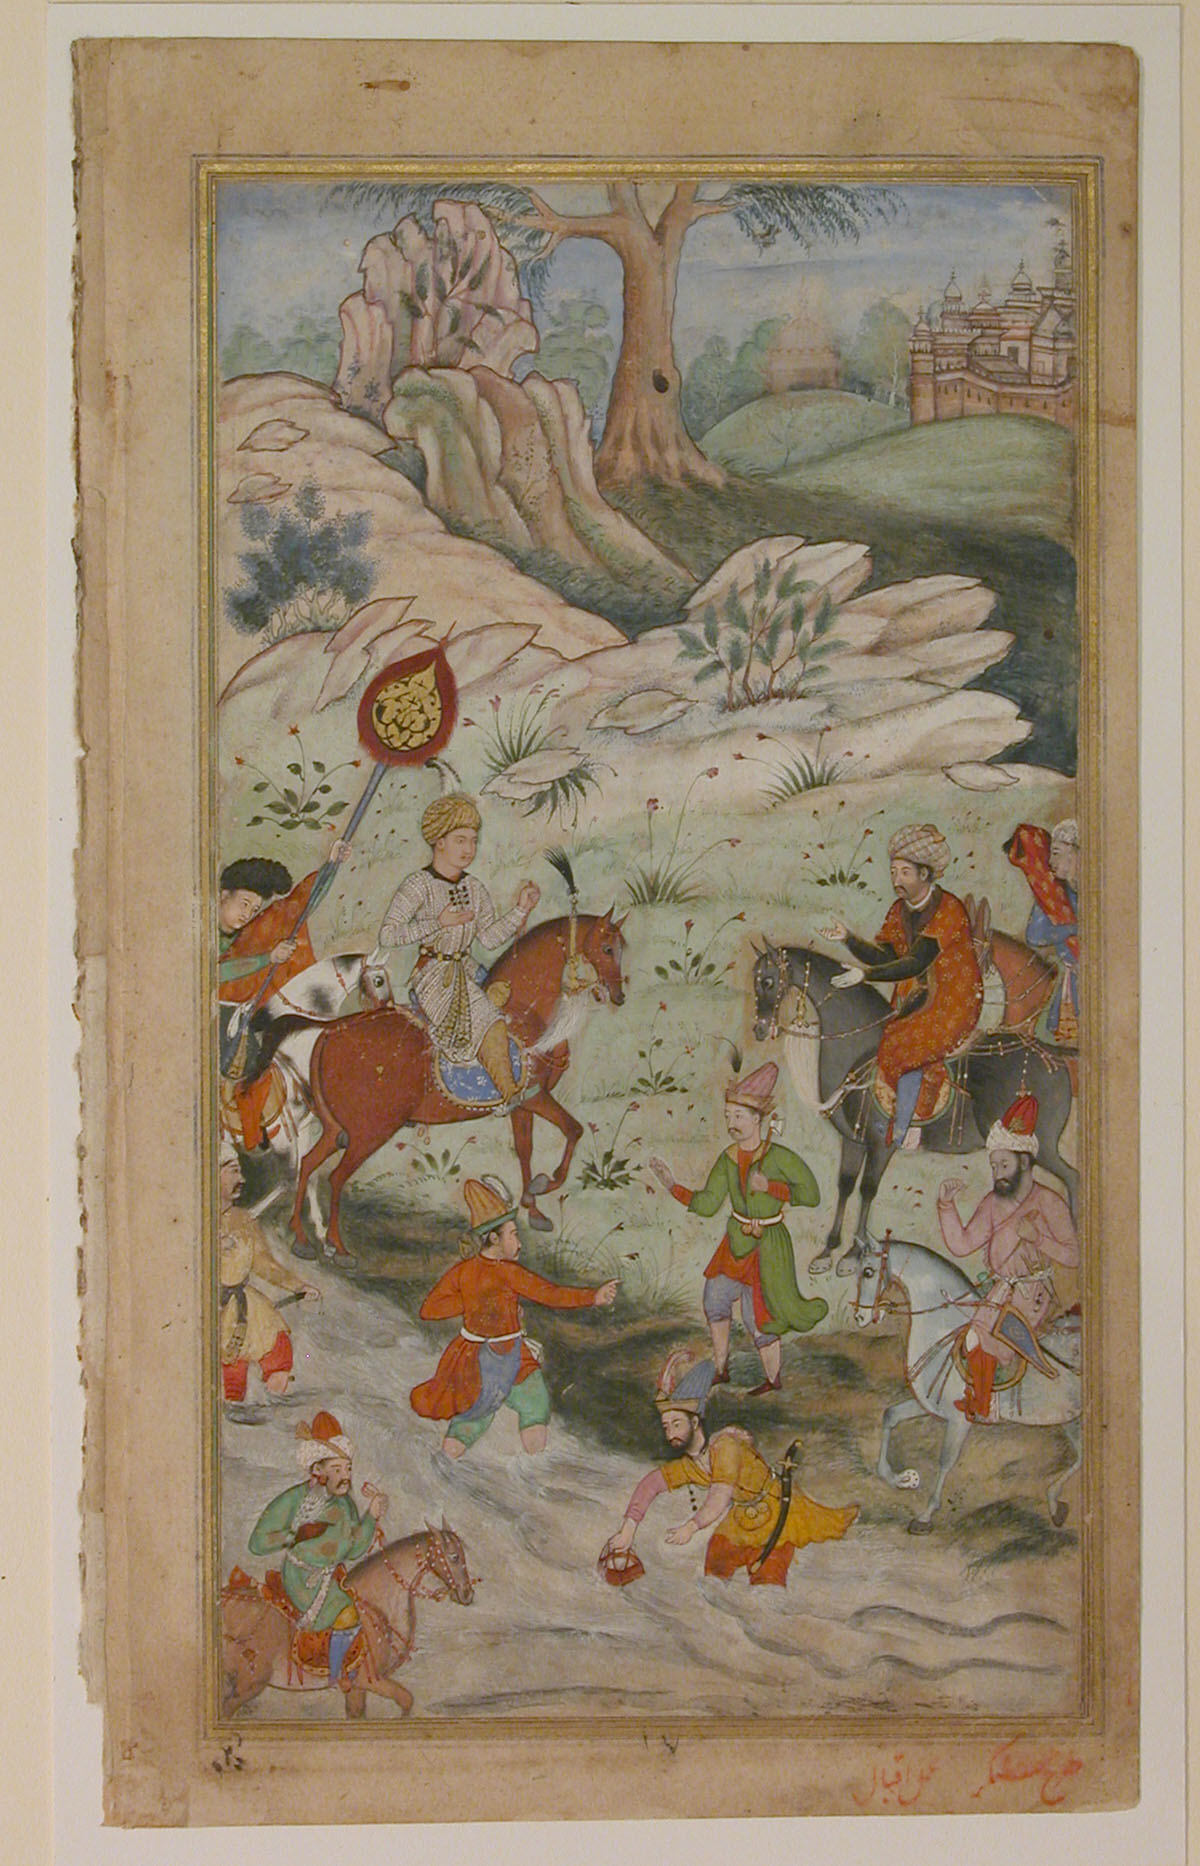 Бабур встречает Султан Али мирзу около Самарканда